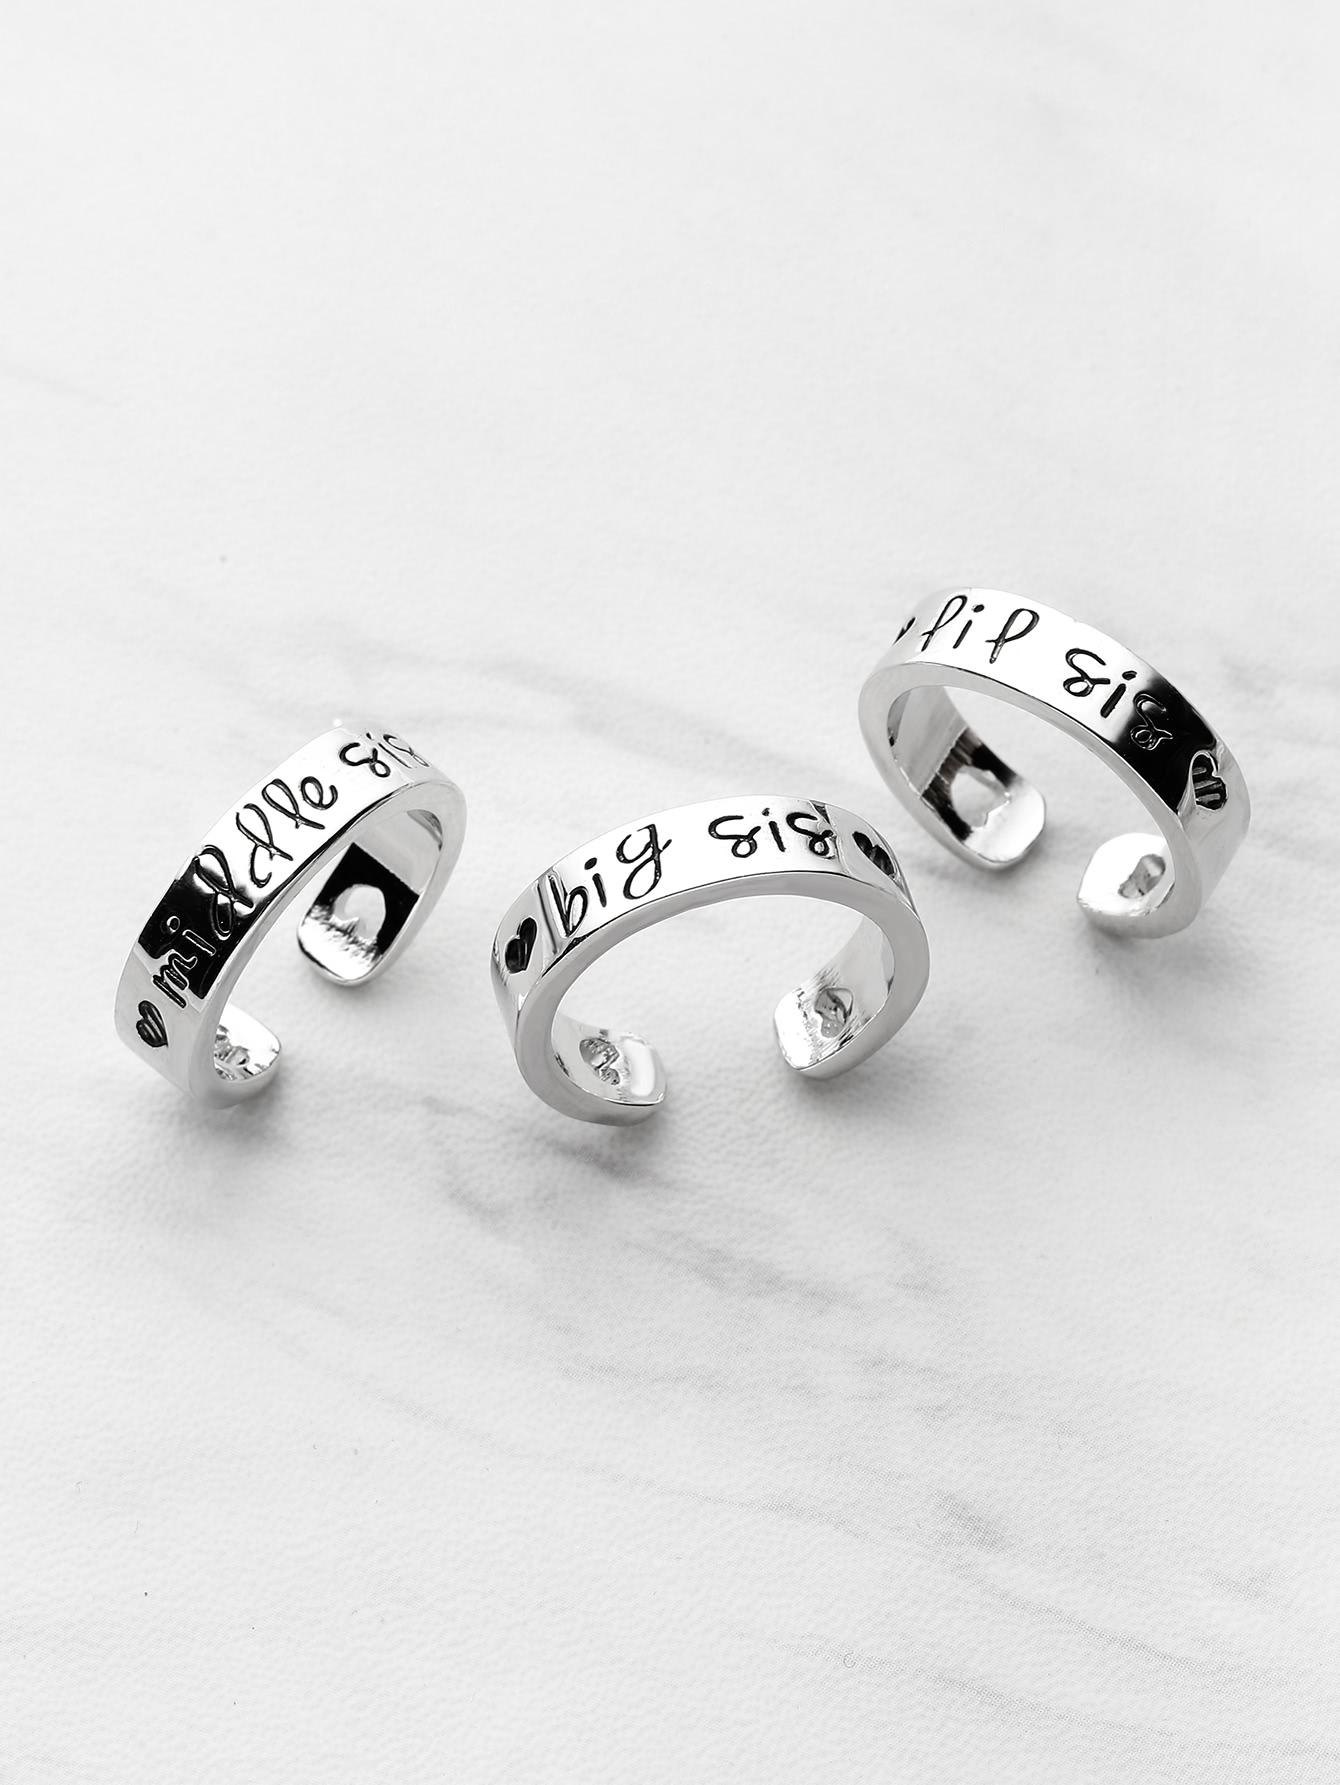 Heart Shaped Detail Friendship Rings 3pcs rhinestone detail layered rings set 3pcs